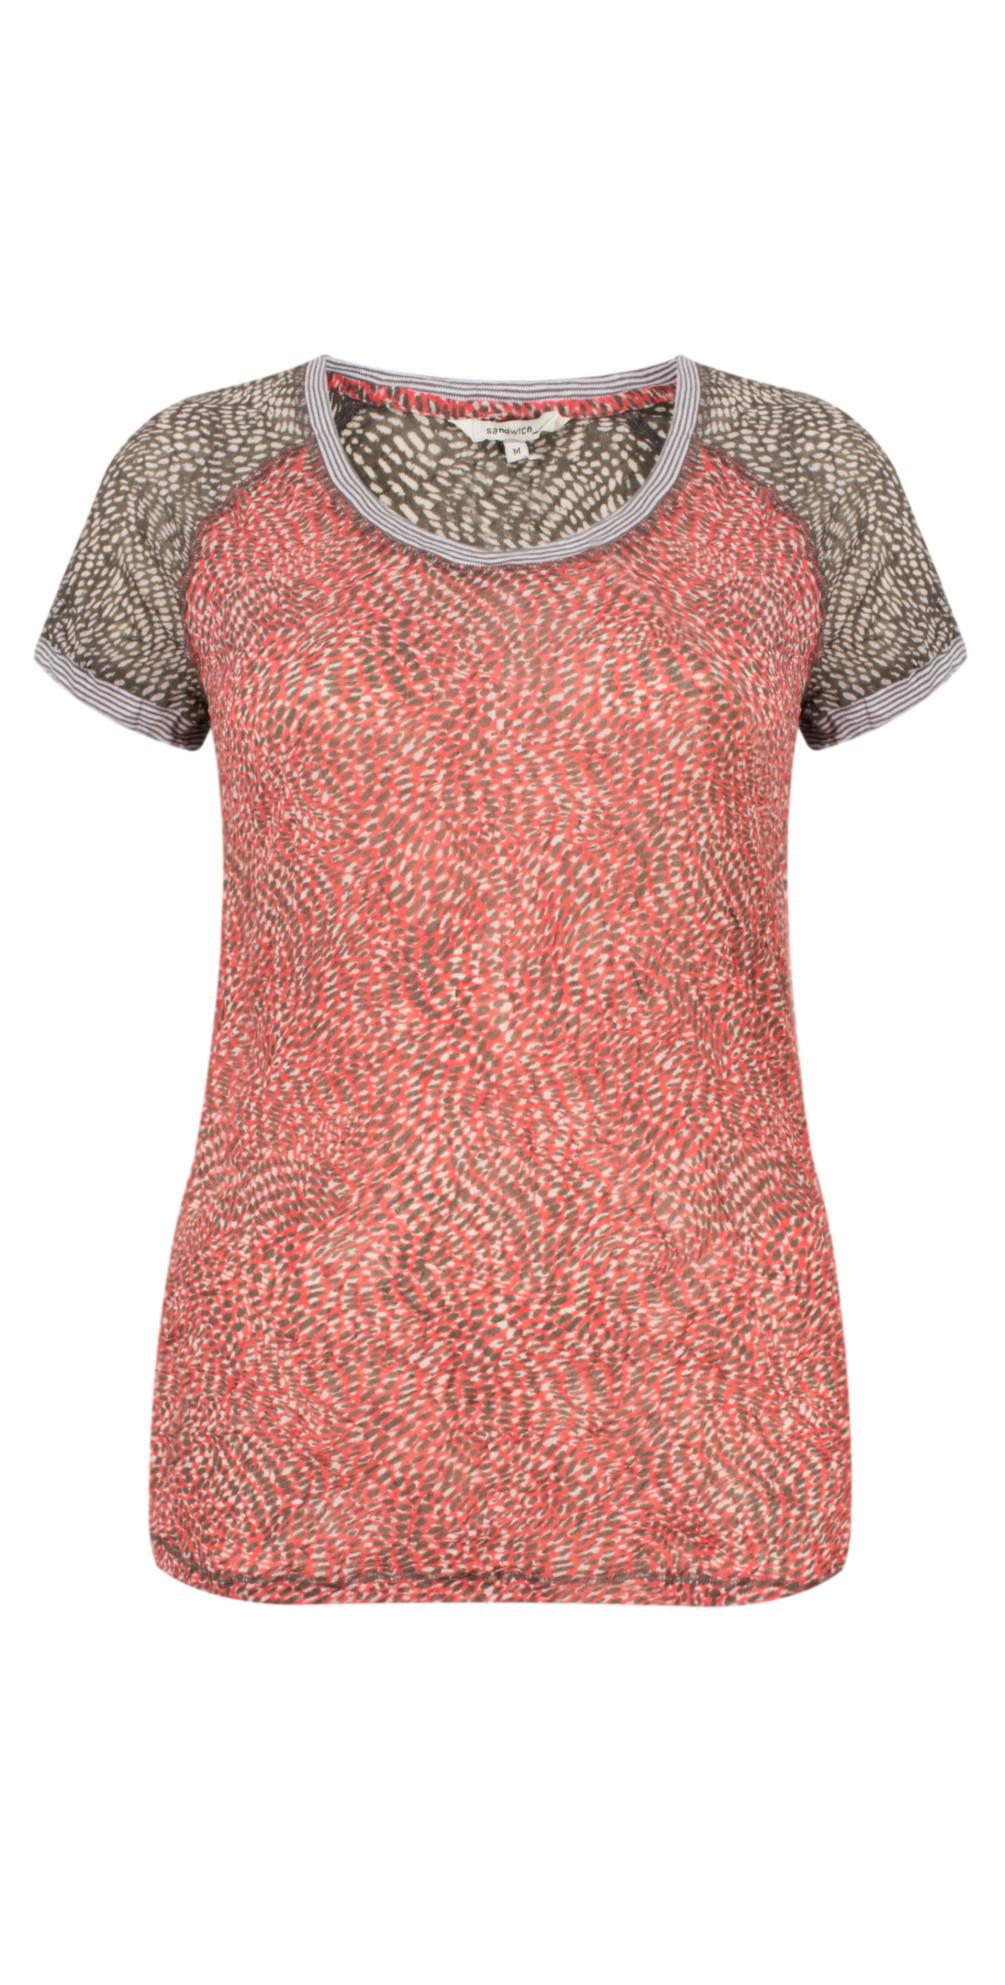 Dotted Print Short Sleeve Tshirt main image